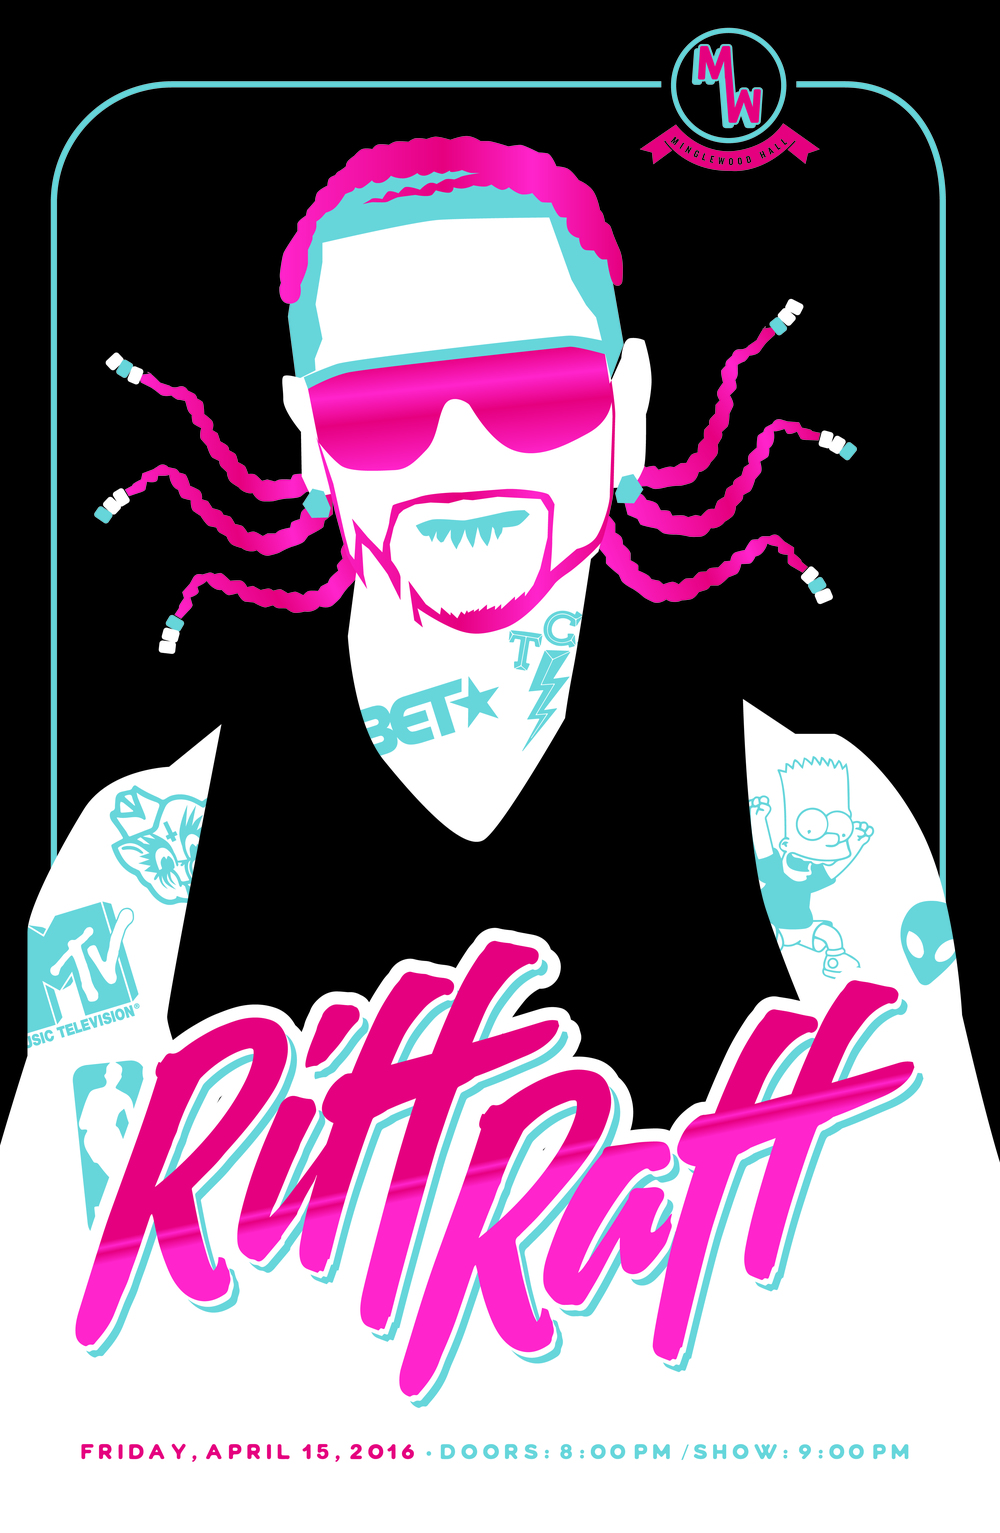 riff-raff-01.jpg